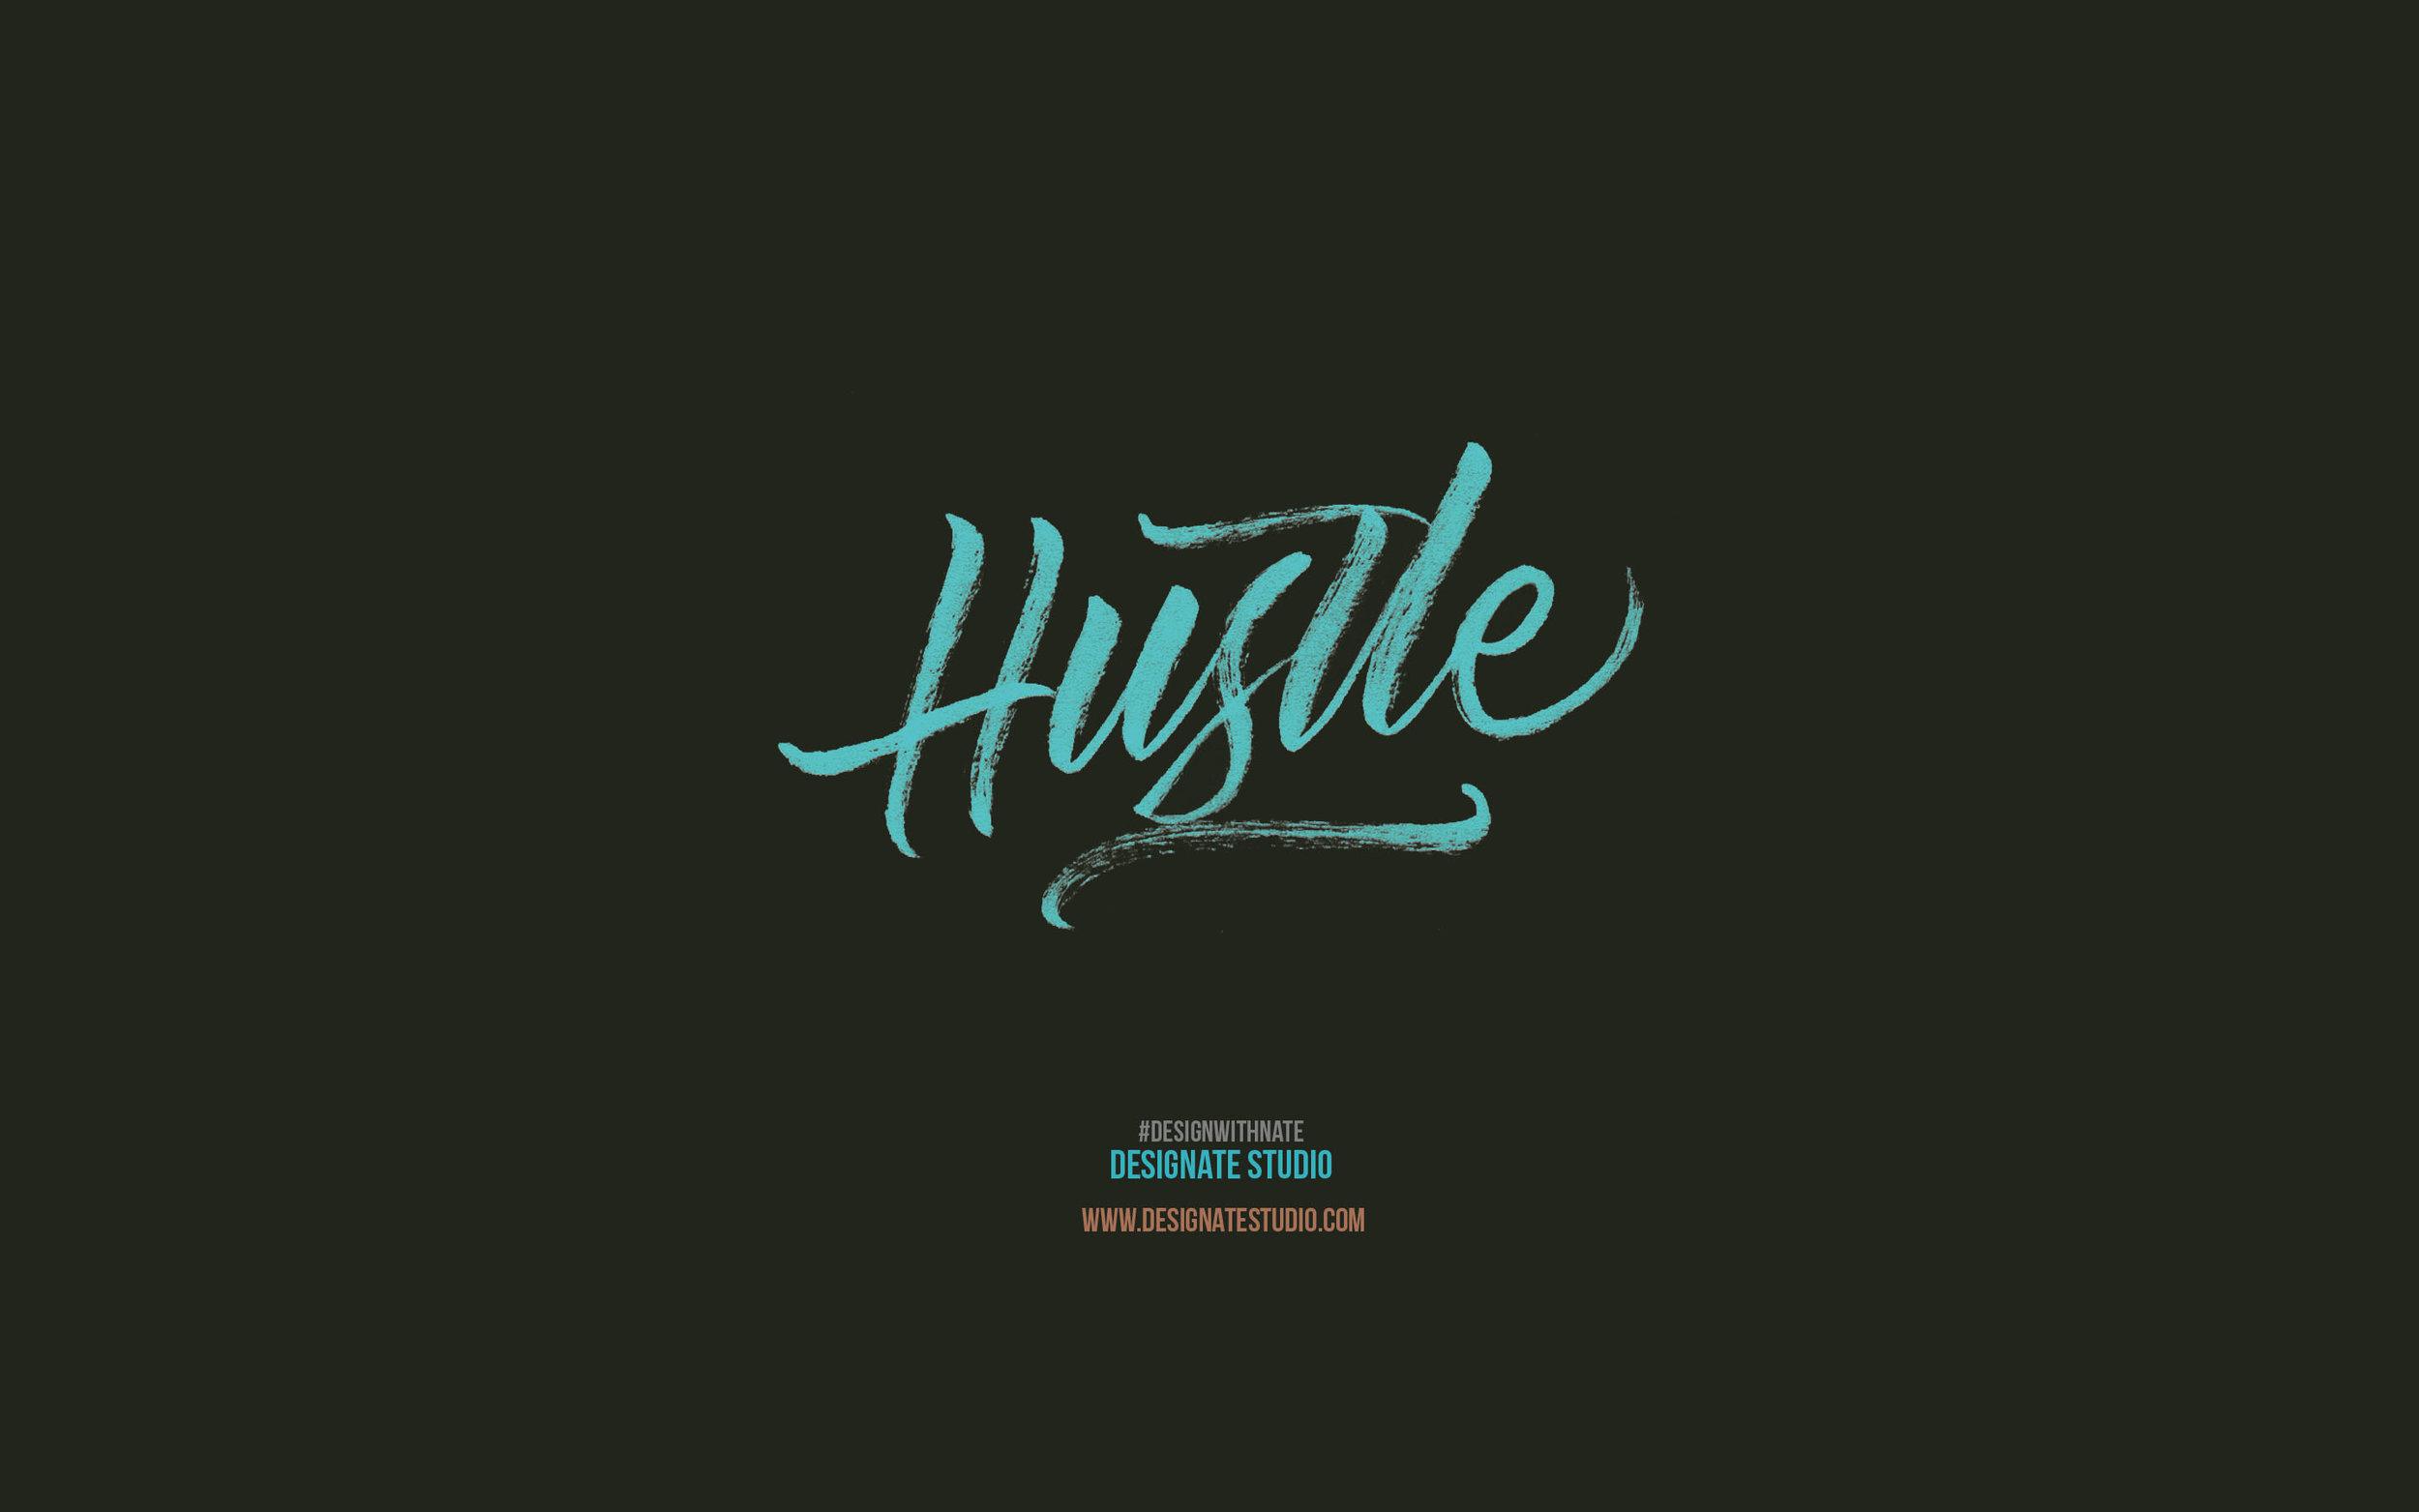 Hustle Wallpaper 2880x1800